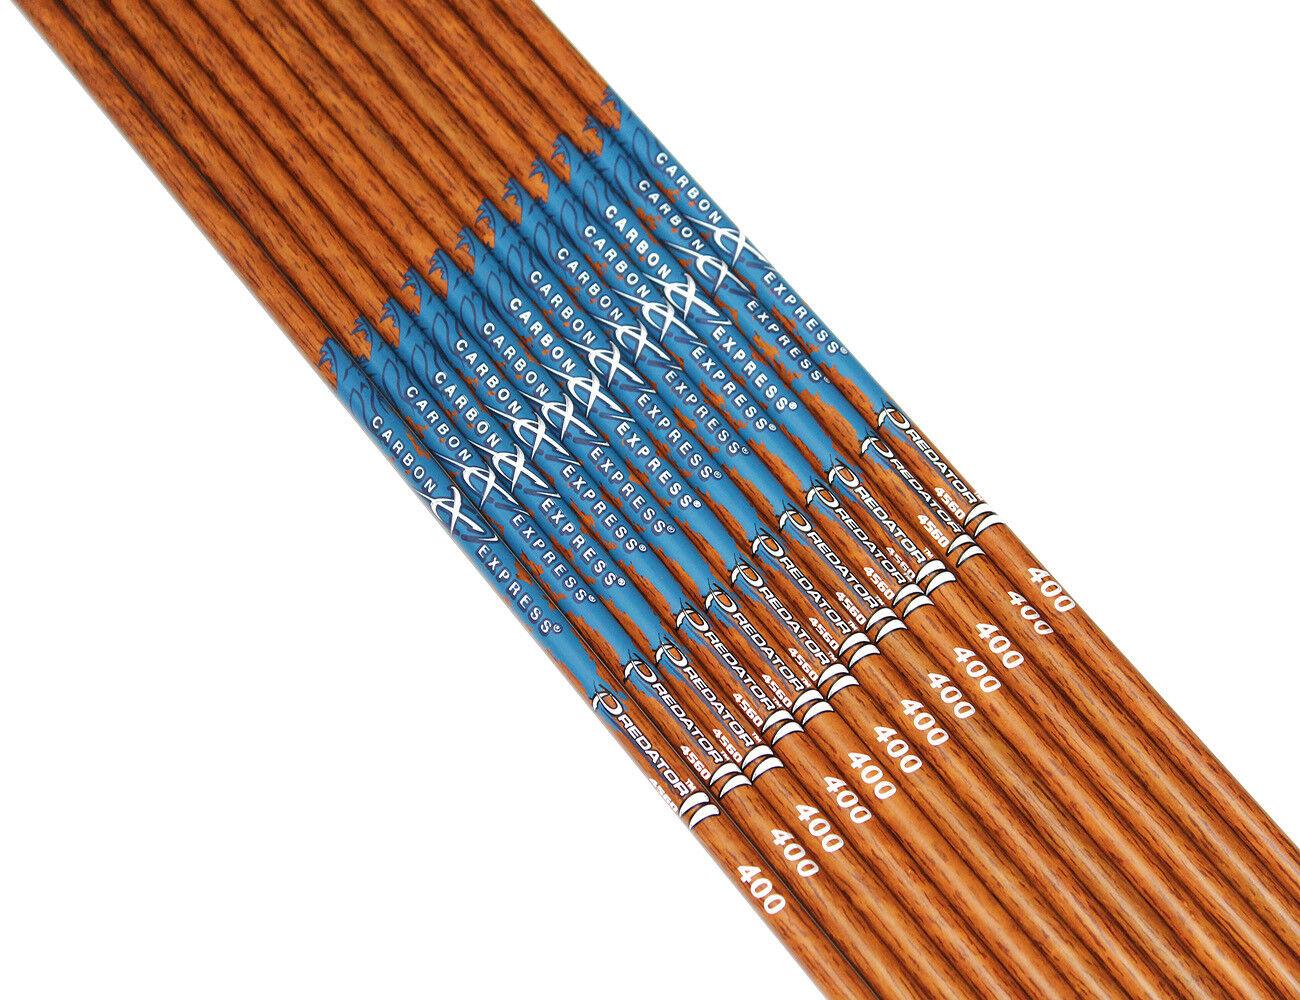 12pcs 12pcs 12pcs pure carbon arrow shaft wood skin arrow shaft sp400 500 600 ID6.2 bow  | Perfekte Verarbeitung  84d7d7